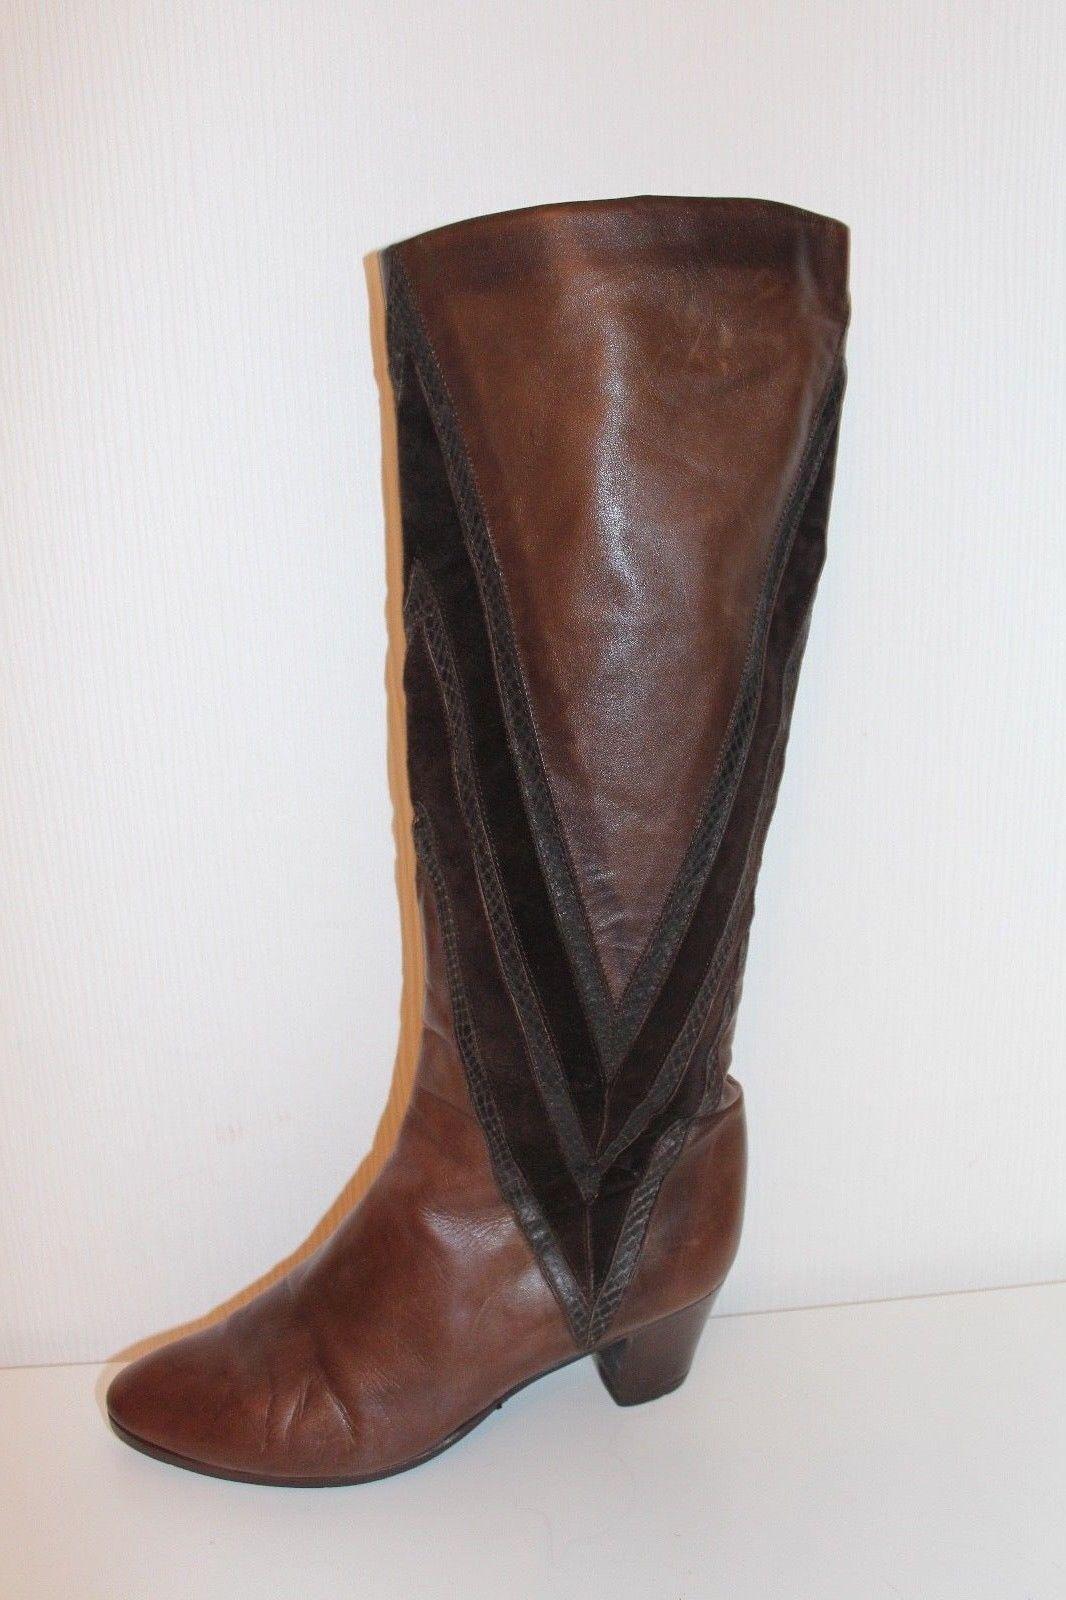 80er 80s Vintage true VTG ECHT Leder Slouch STIEFEL 37 Leather Stiefel UK 4 braun  | Schön